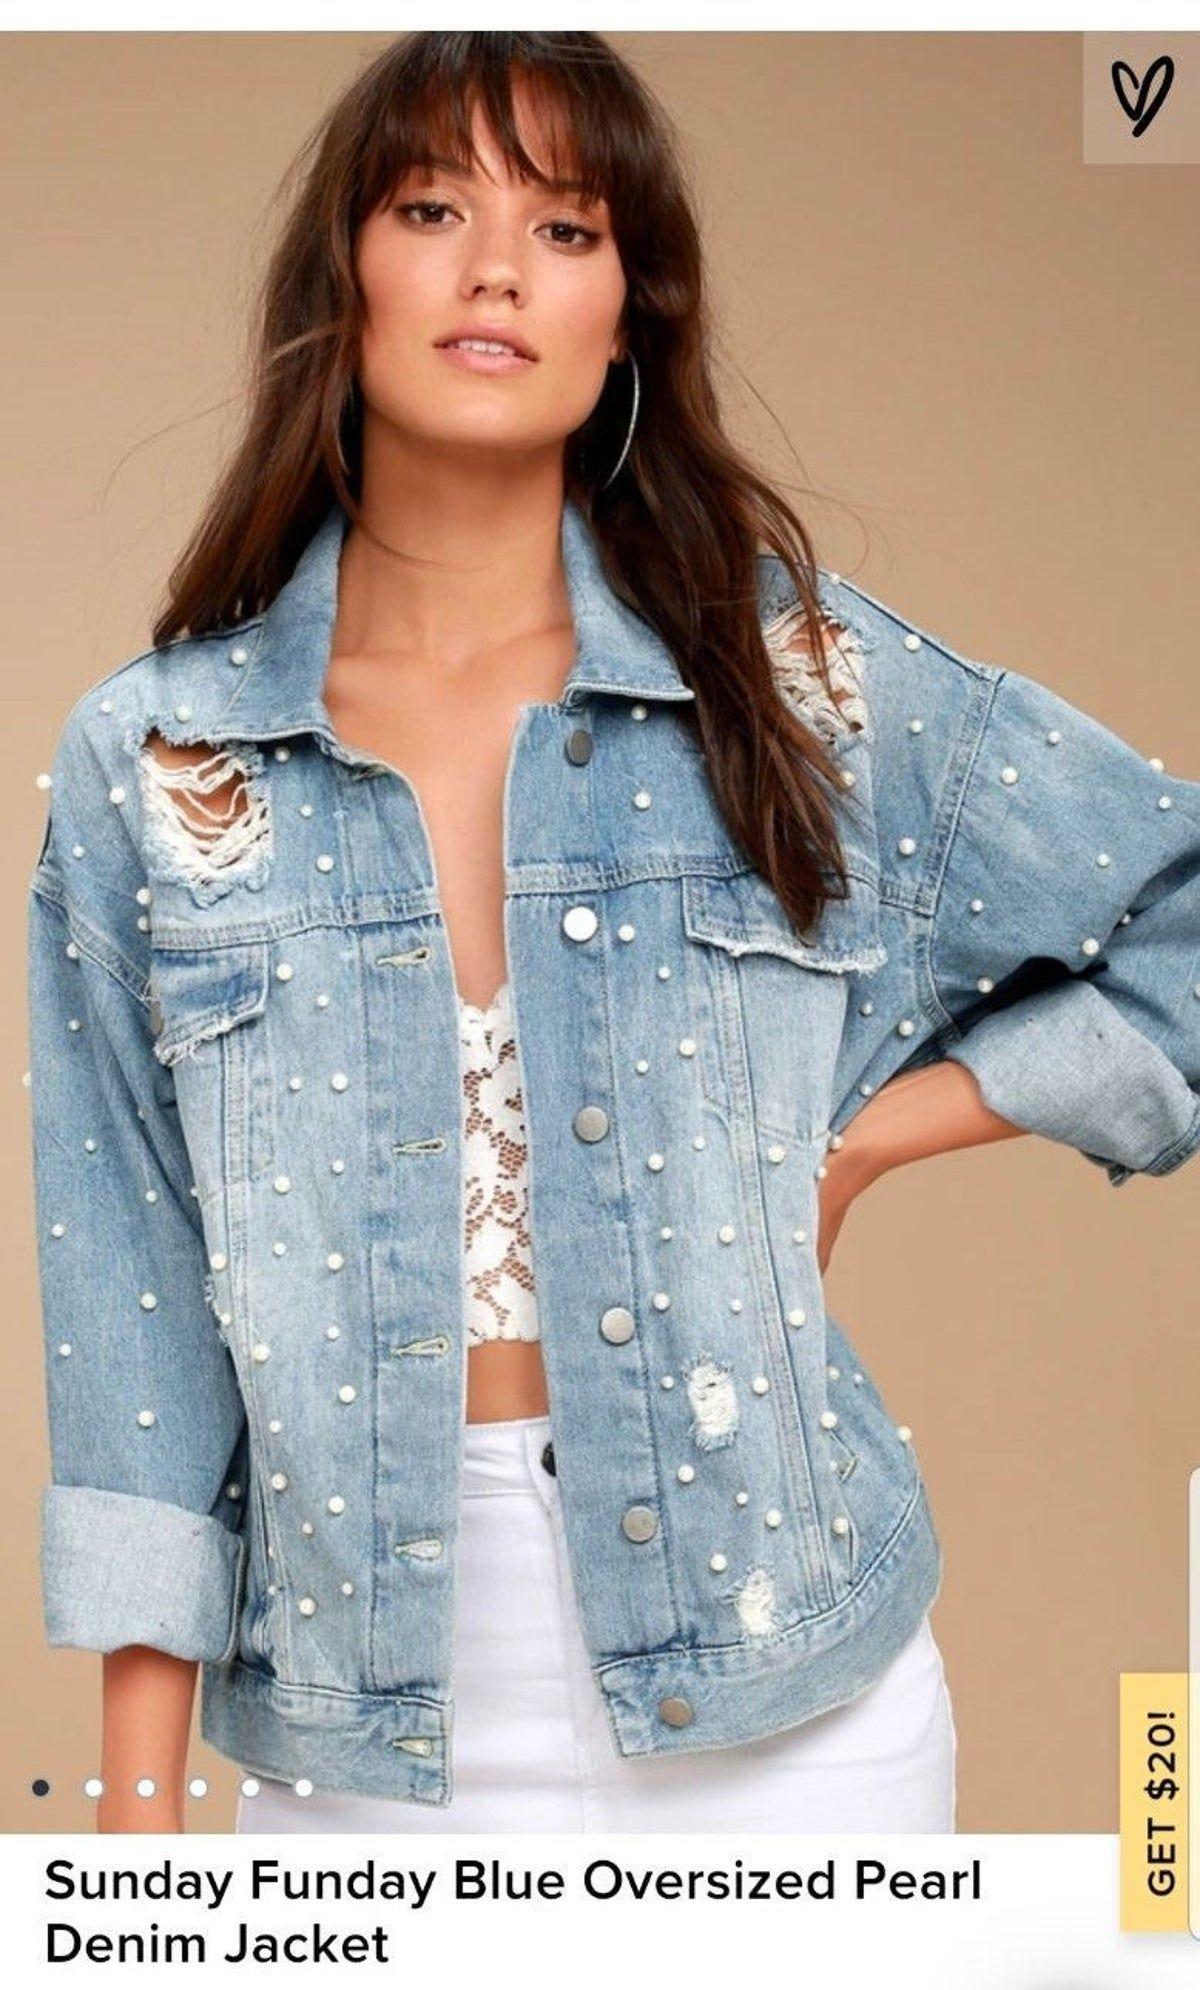 Pin By Nathalia Ramirez On Jean Denim Fashion Embellished Denim Jacket Denim Jacket [ 1990 x 1200 Pixel ]